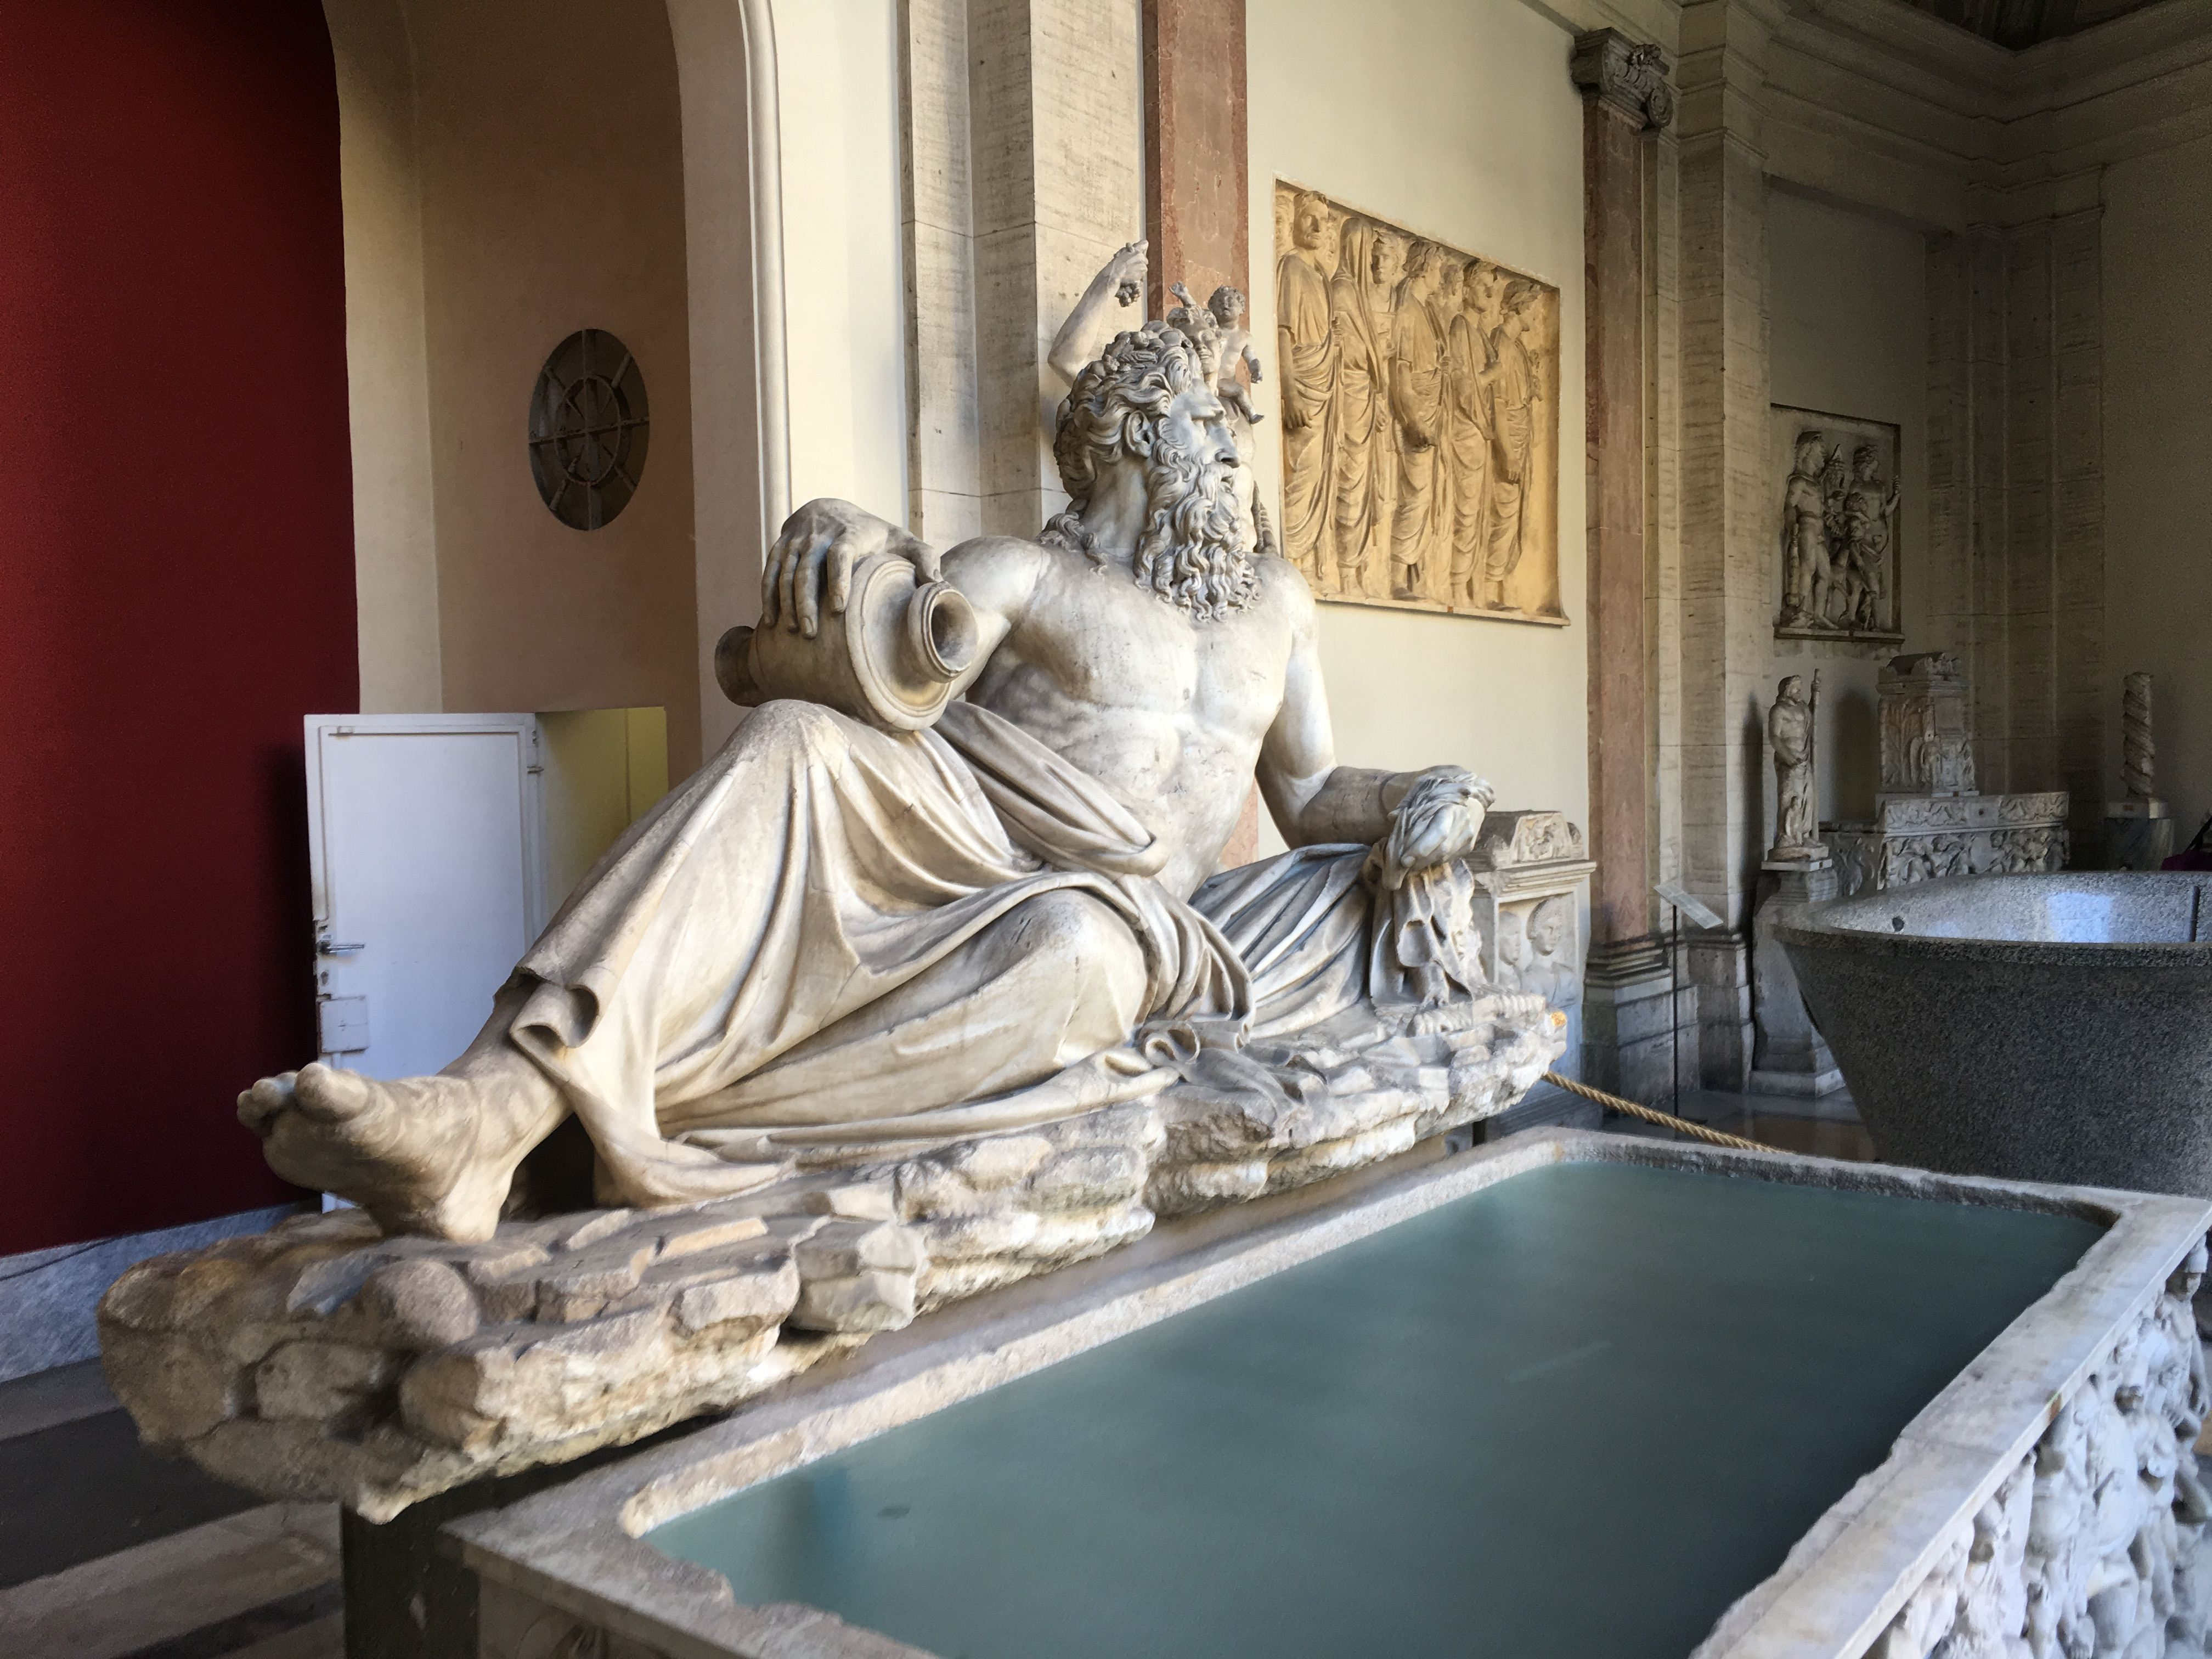 museu-do-vaticano-roma